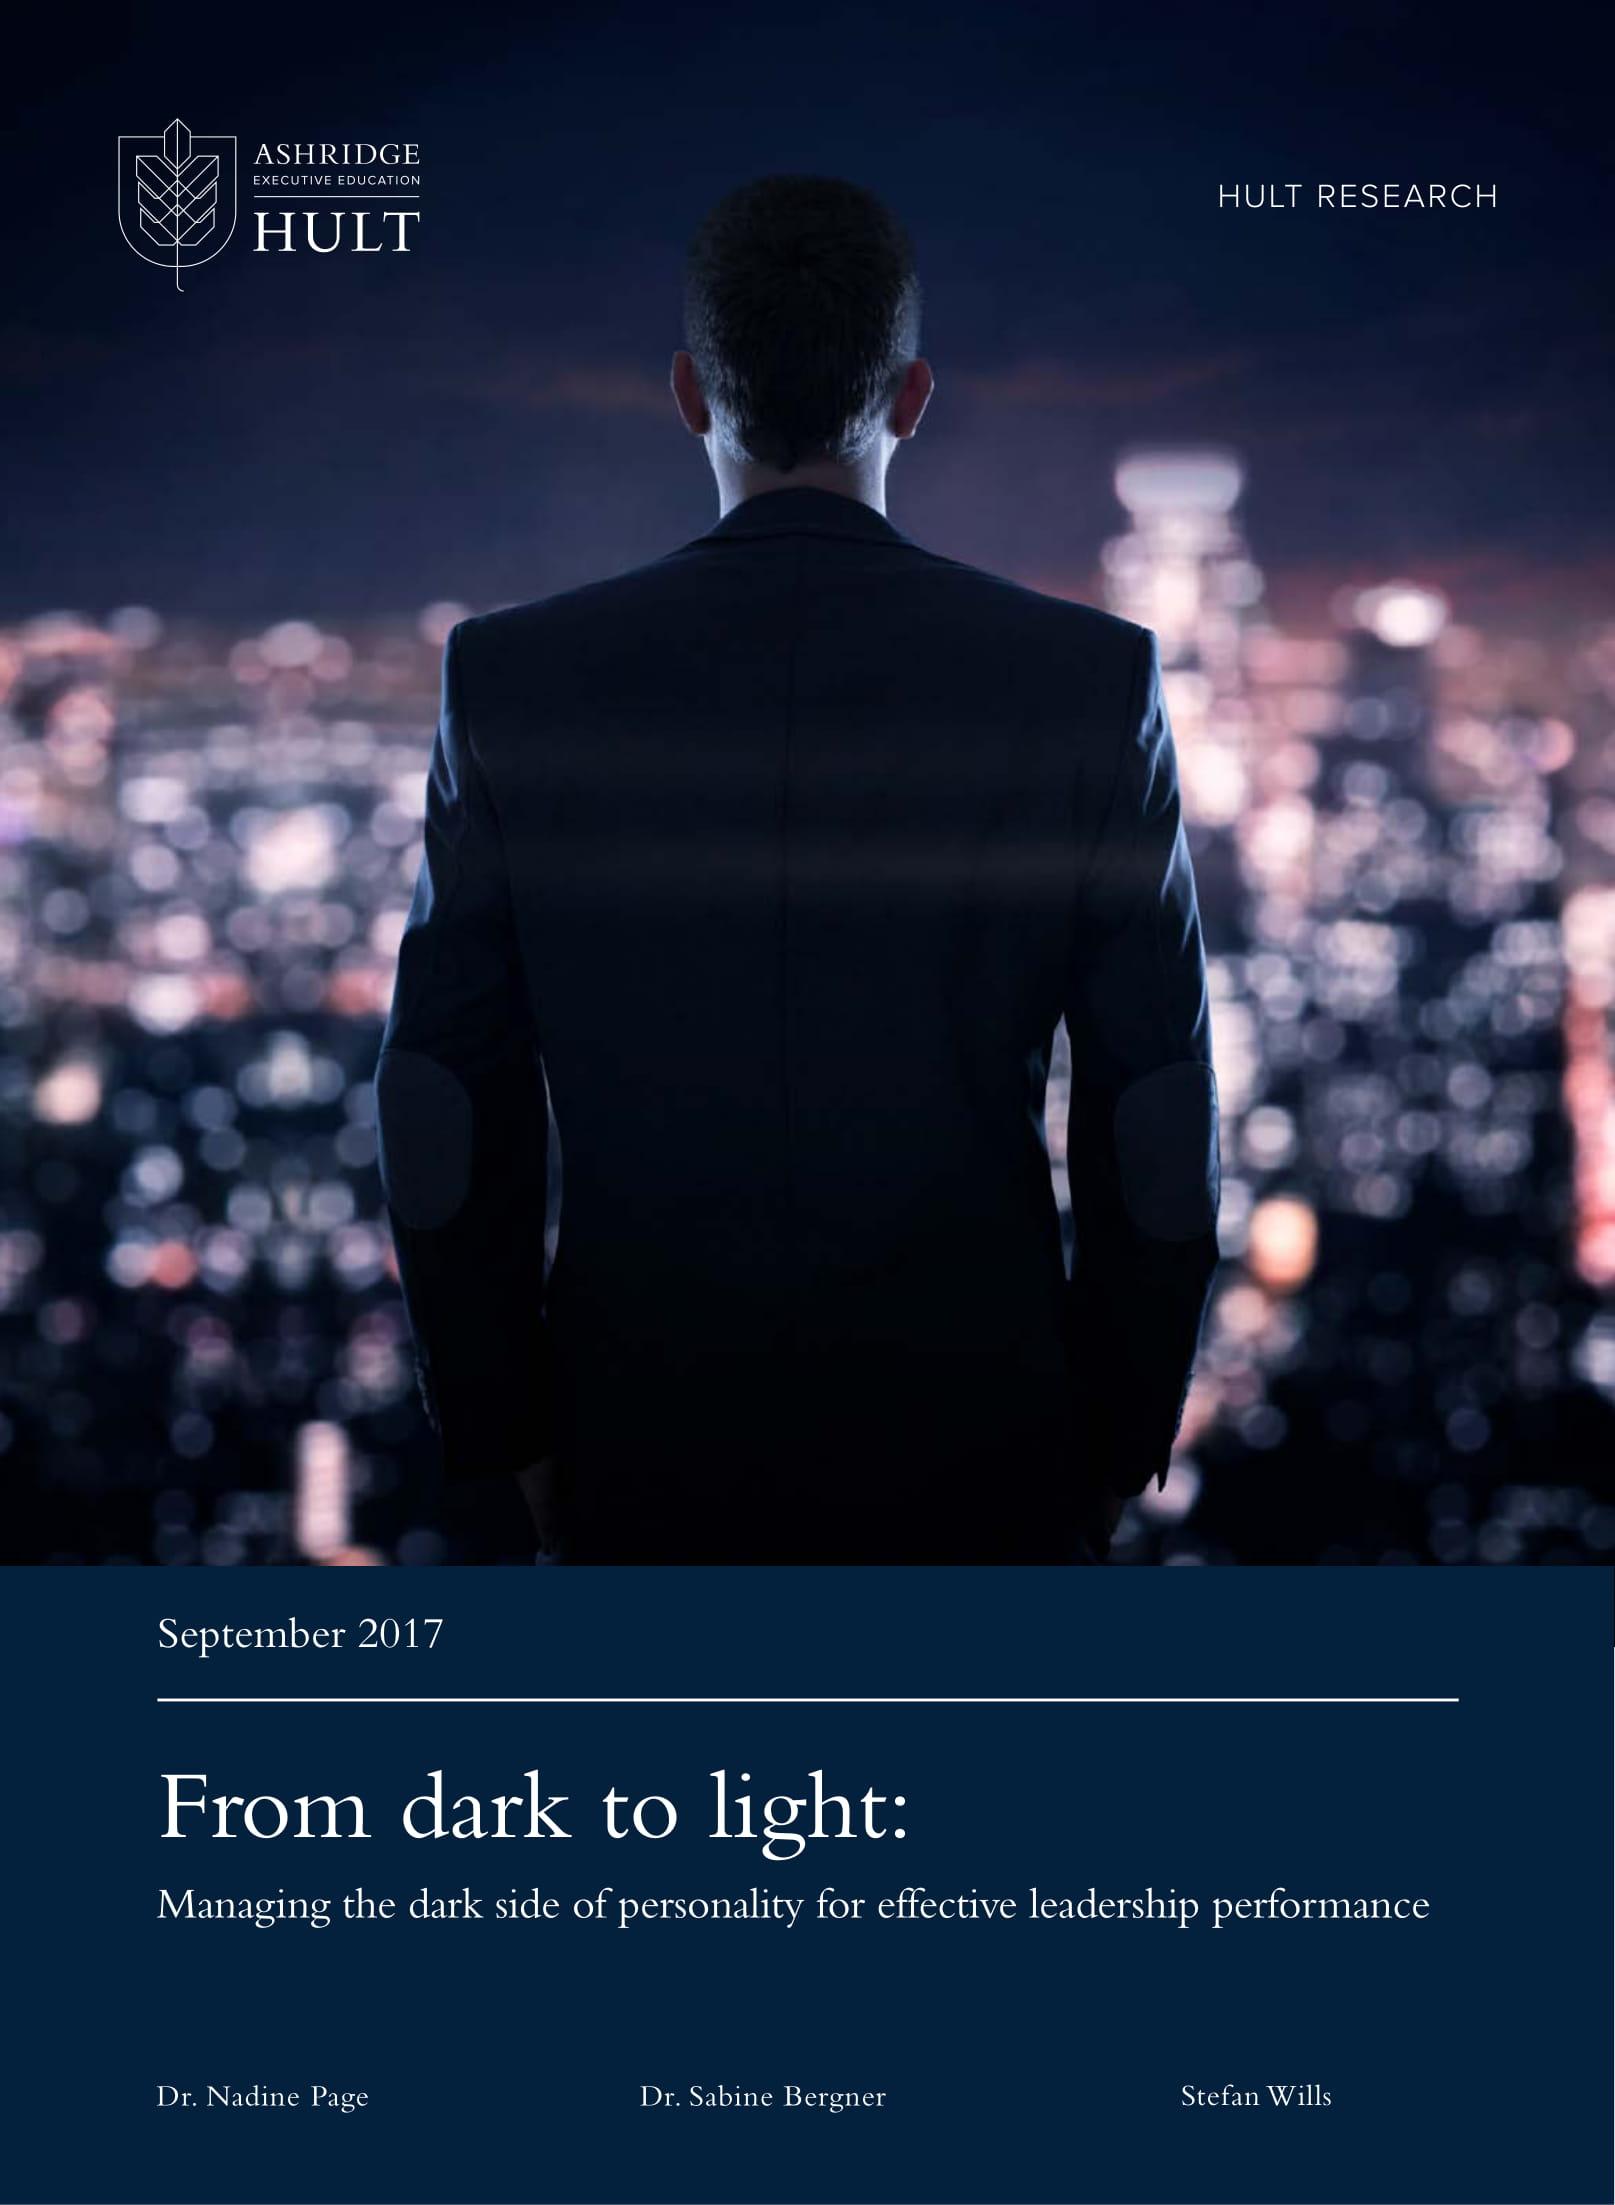 Ashridge-Hult-The-bright-side-of-dark-leadership-01.jpg